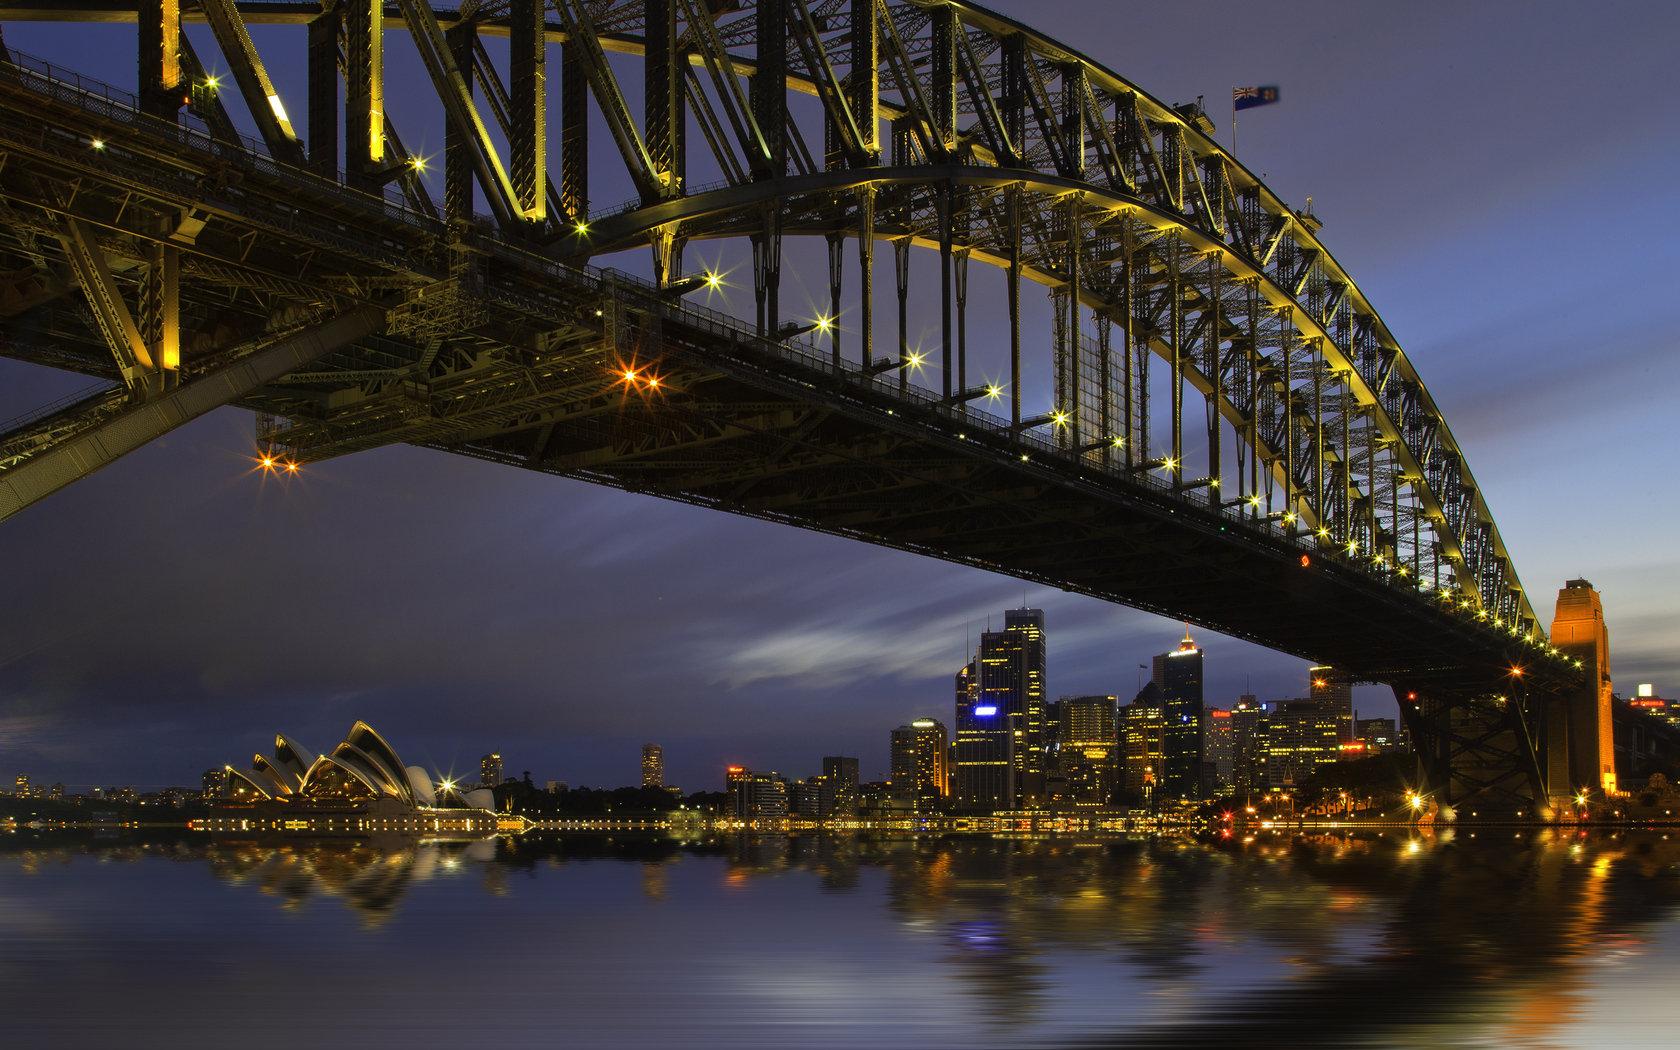 Sydney harbour bridge wallpapers 1680x1050 desktop backgrounds best sydney harbour bridge background id484895 for high resolution hd 1680x1050 pc altavistaventures Choice Image